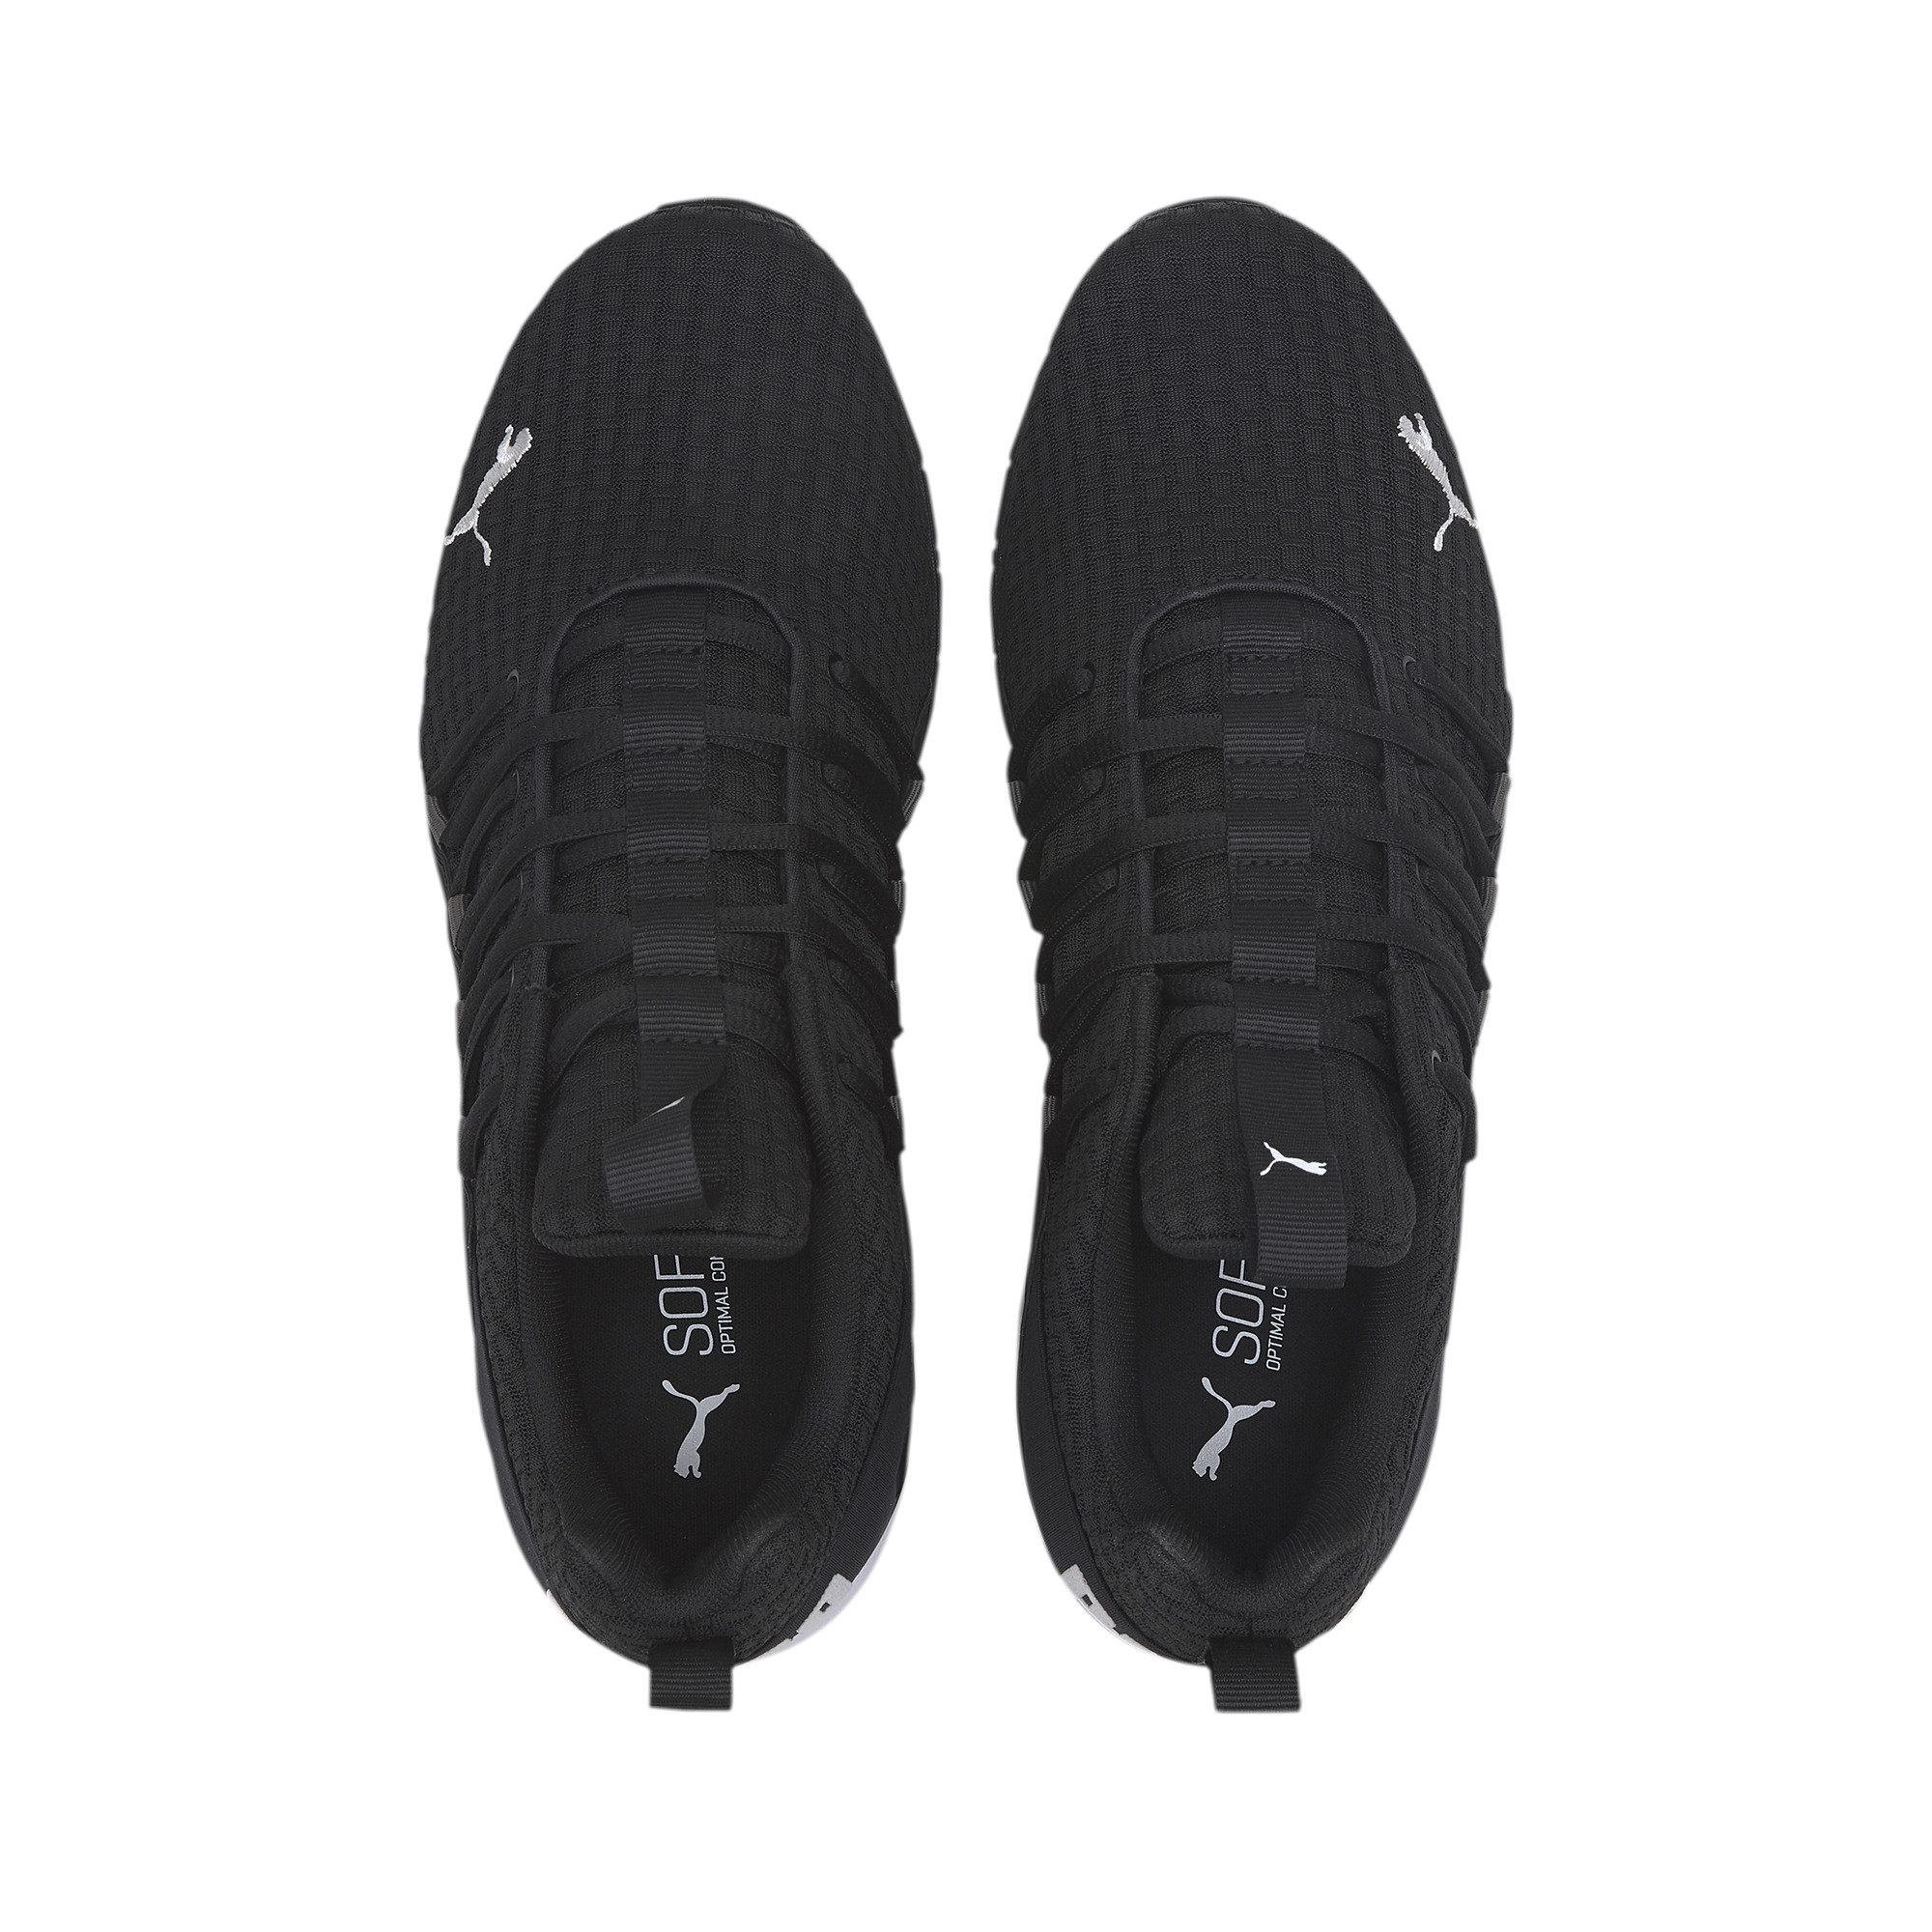 PUMA-Men-039-s-Axelion-Block-Running-Shoes thumbnail 22